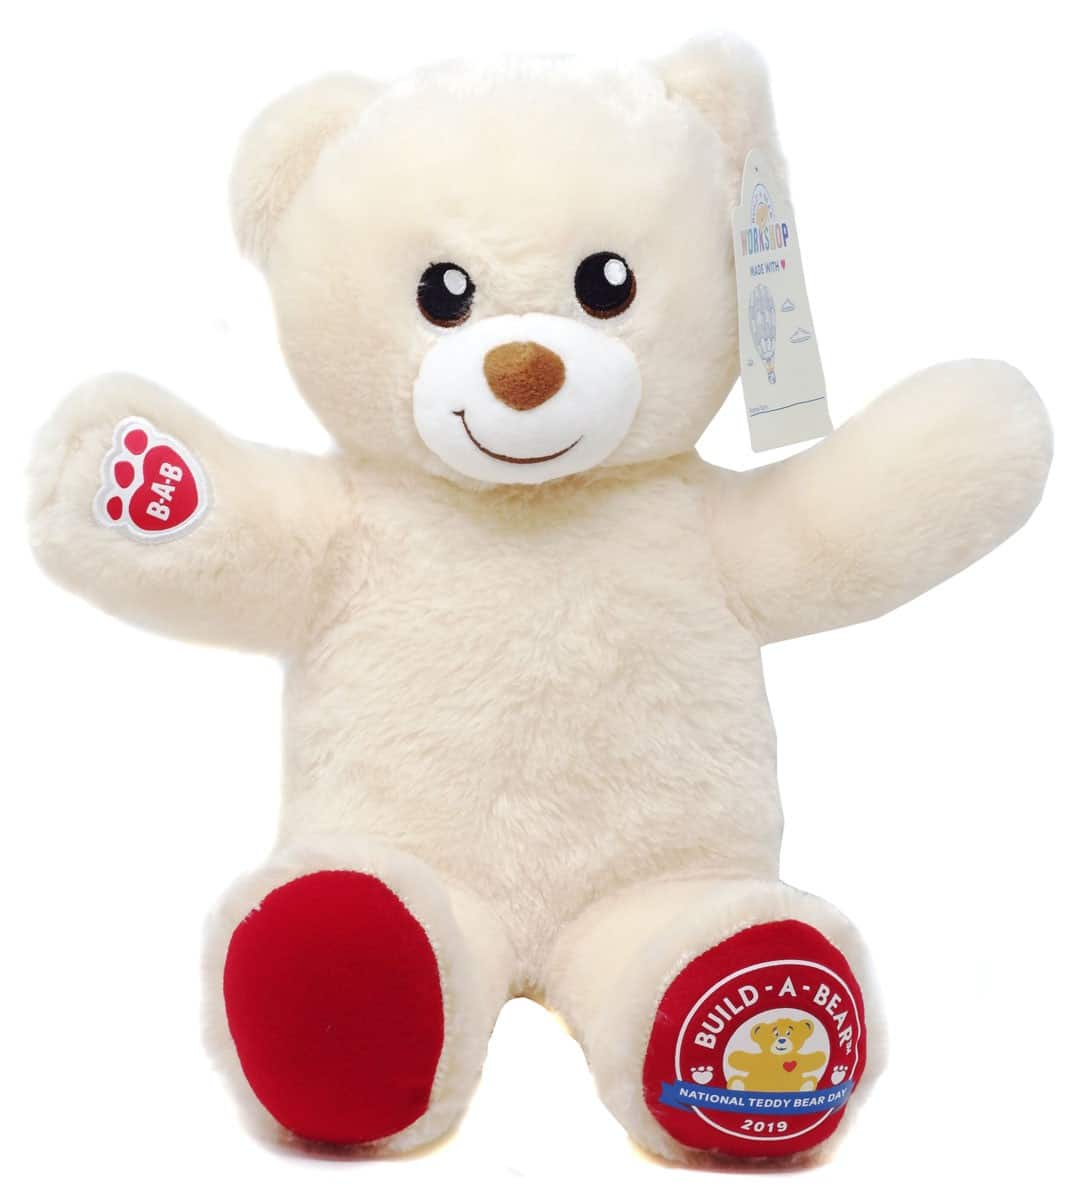 Build-A-Bear Bab Cube Bear Fashion Set Assortment $1.00 ymmv